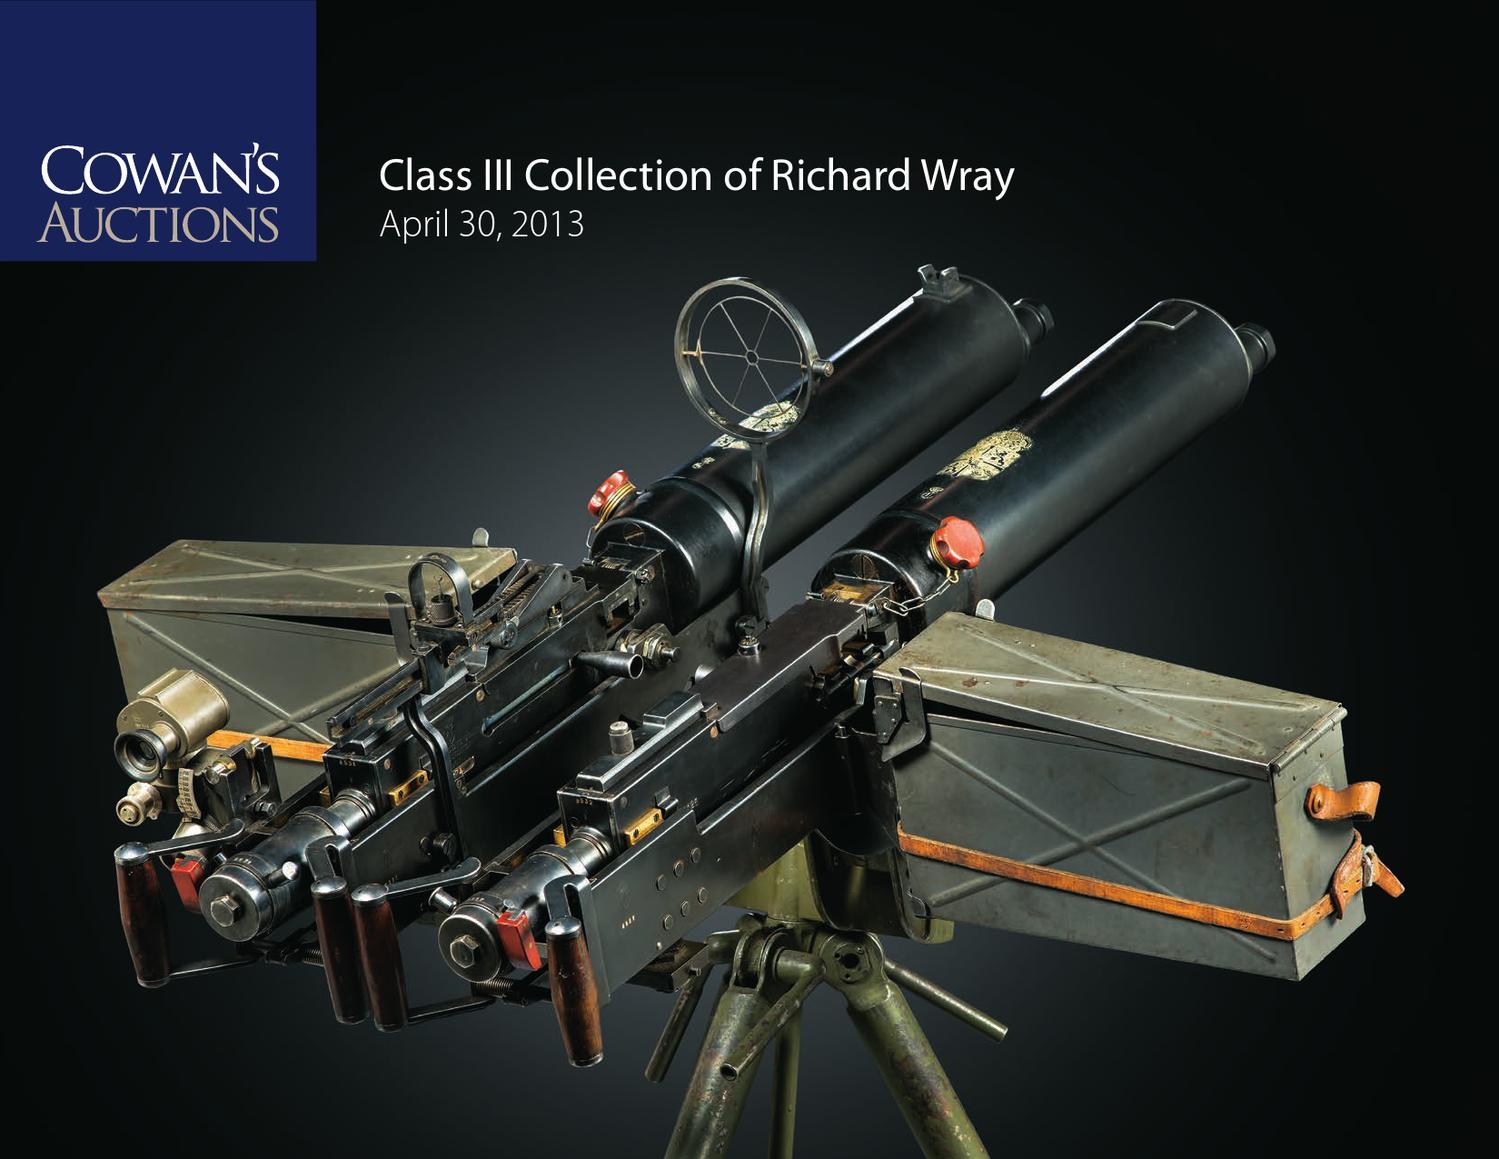 Class III Collection of Richard Wray